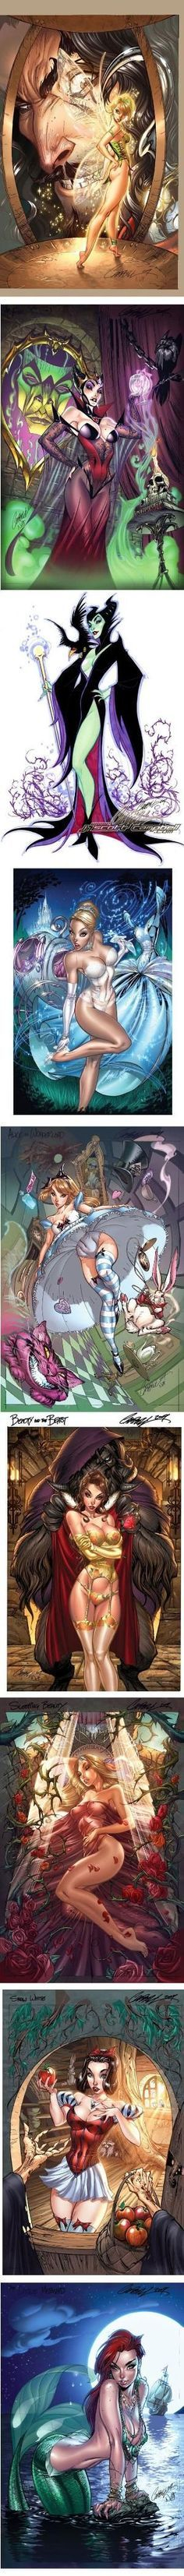 J. Scott Campbell Draws Naughty Disney Princesses by AislingH